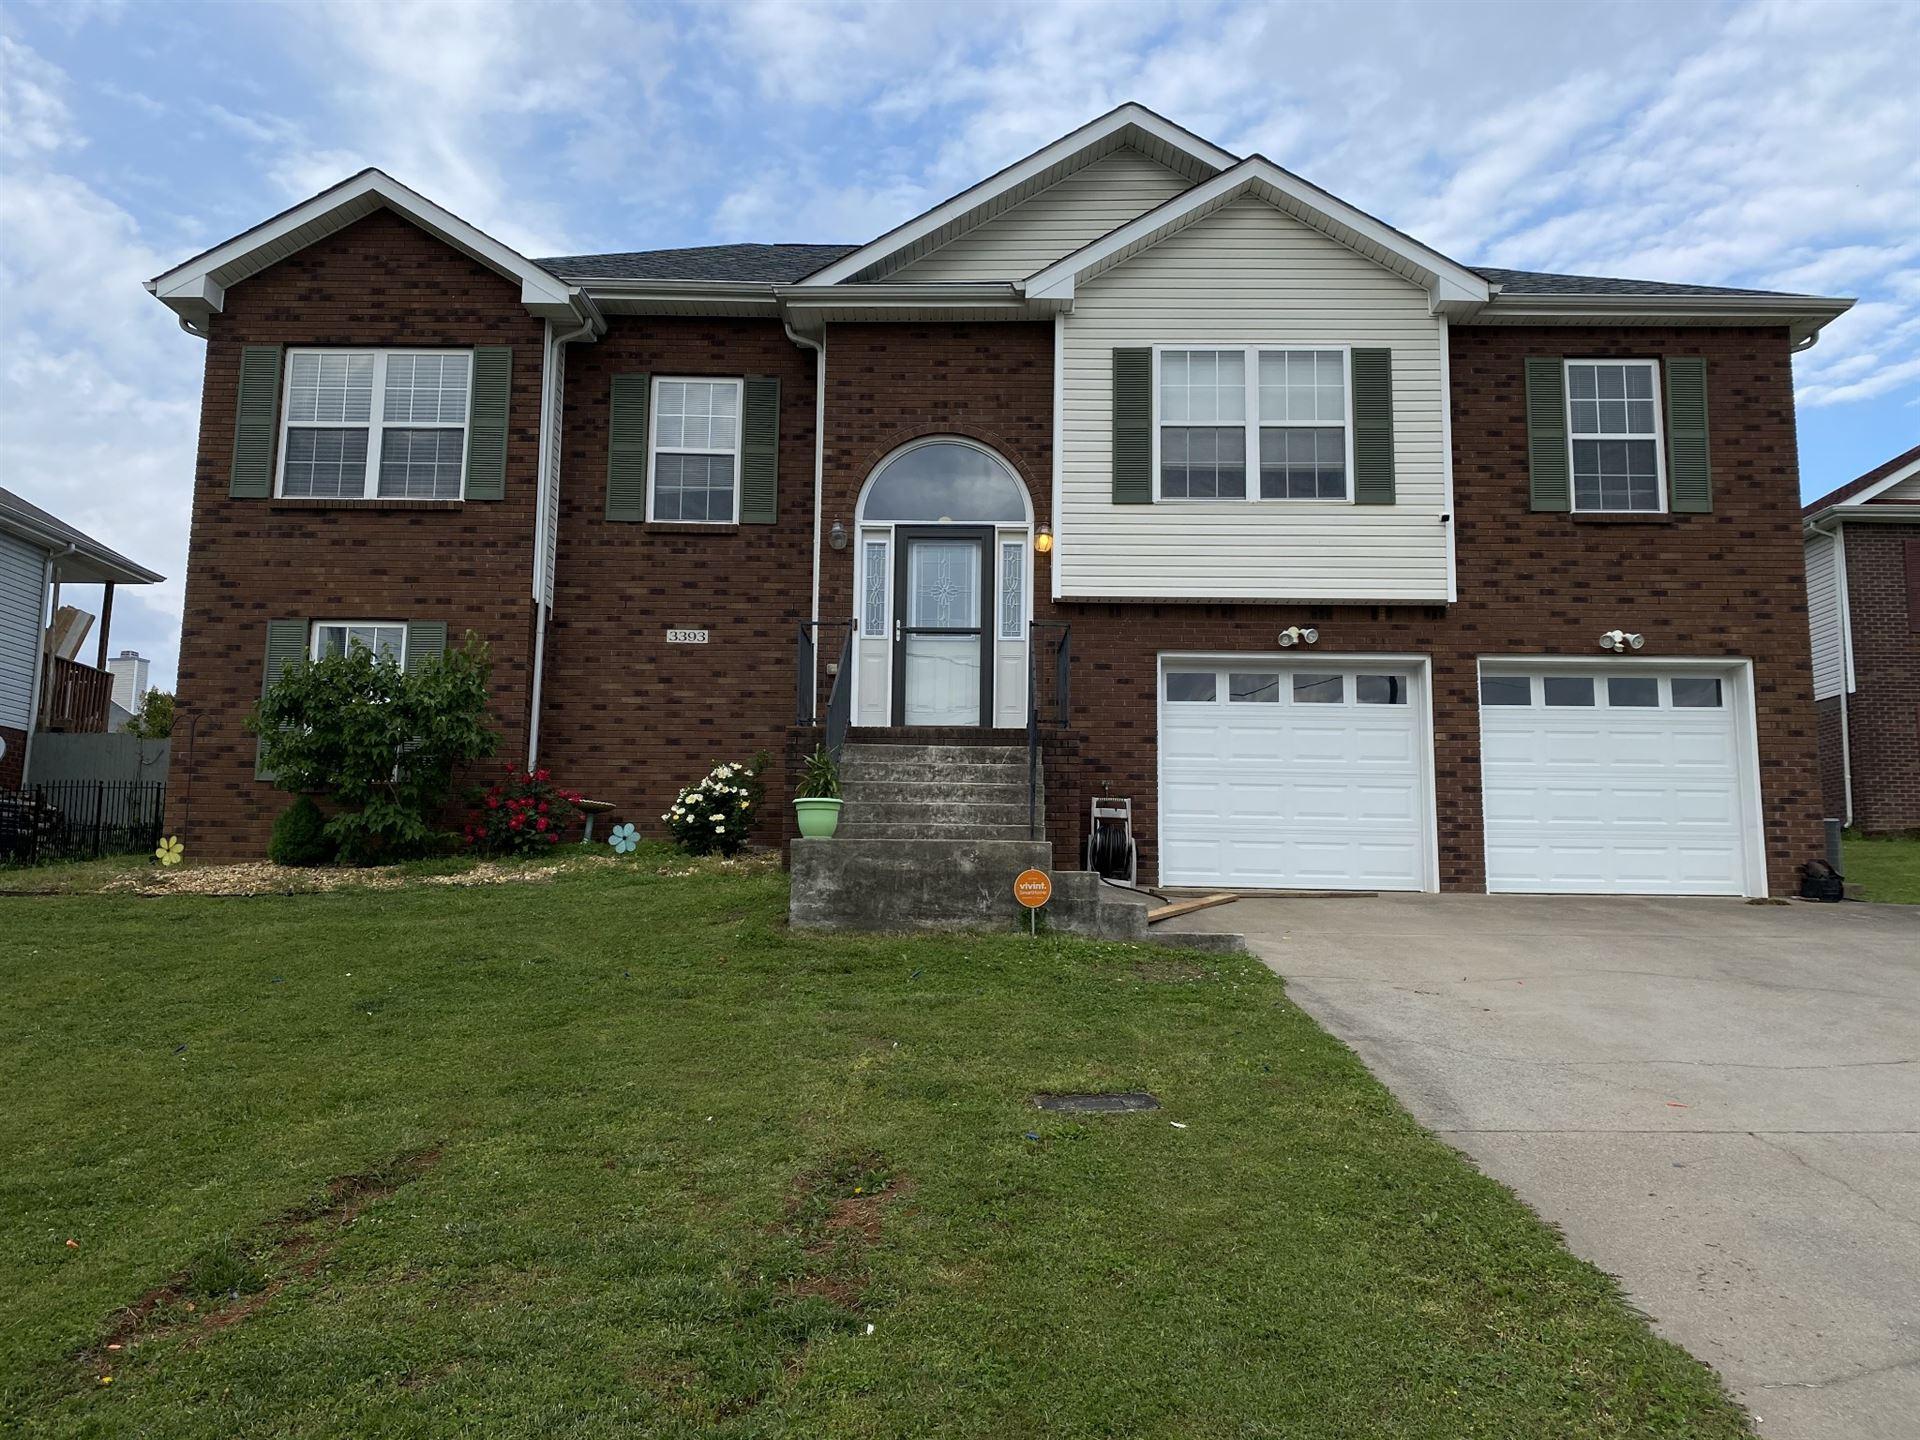 3393 Quicksilver Ct, Clarksville, TN 37042 - MLS#: 2251418